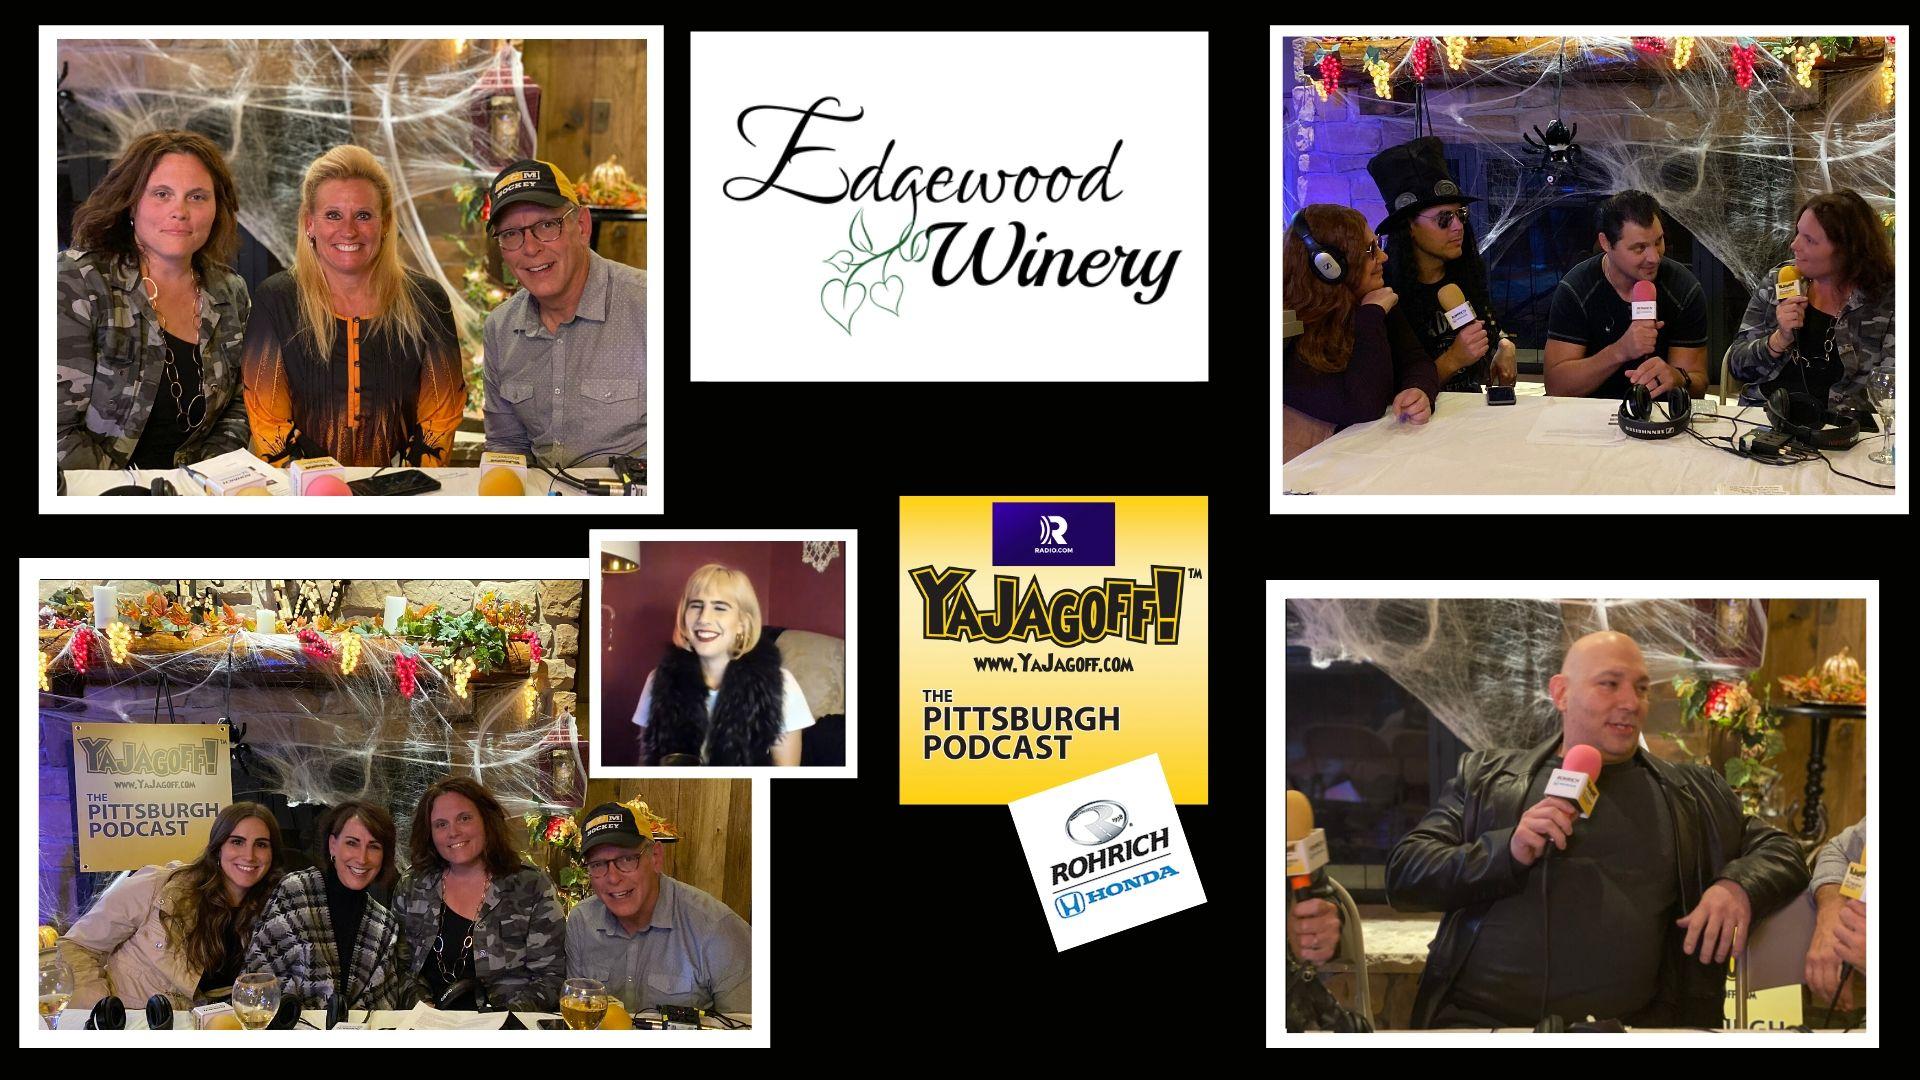 YaJagoff Podcast Edgewood Winery